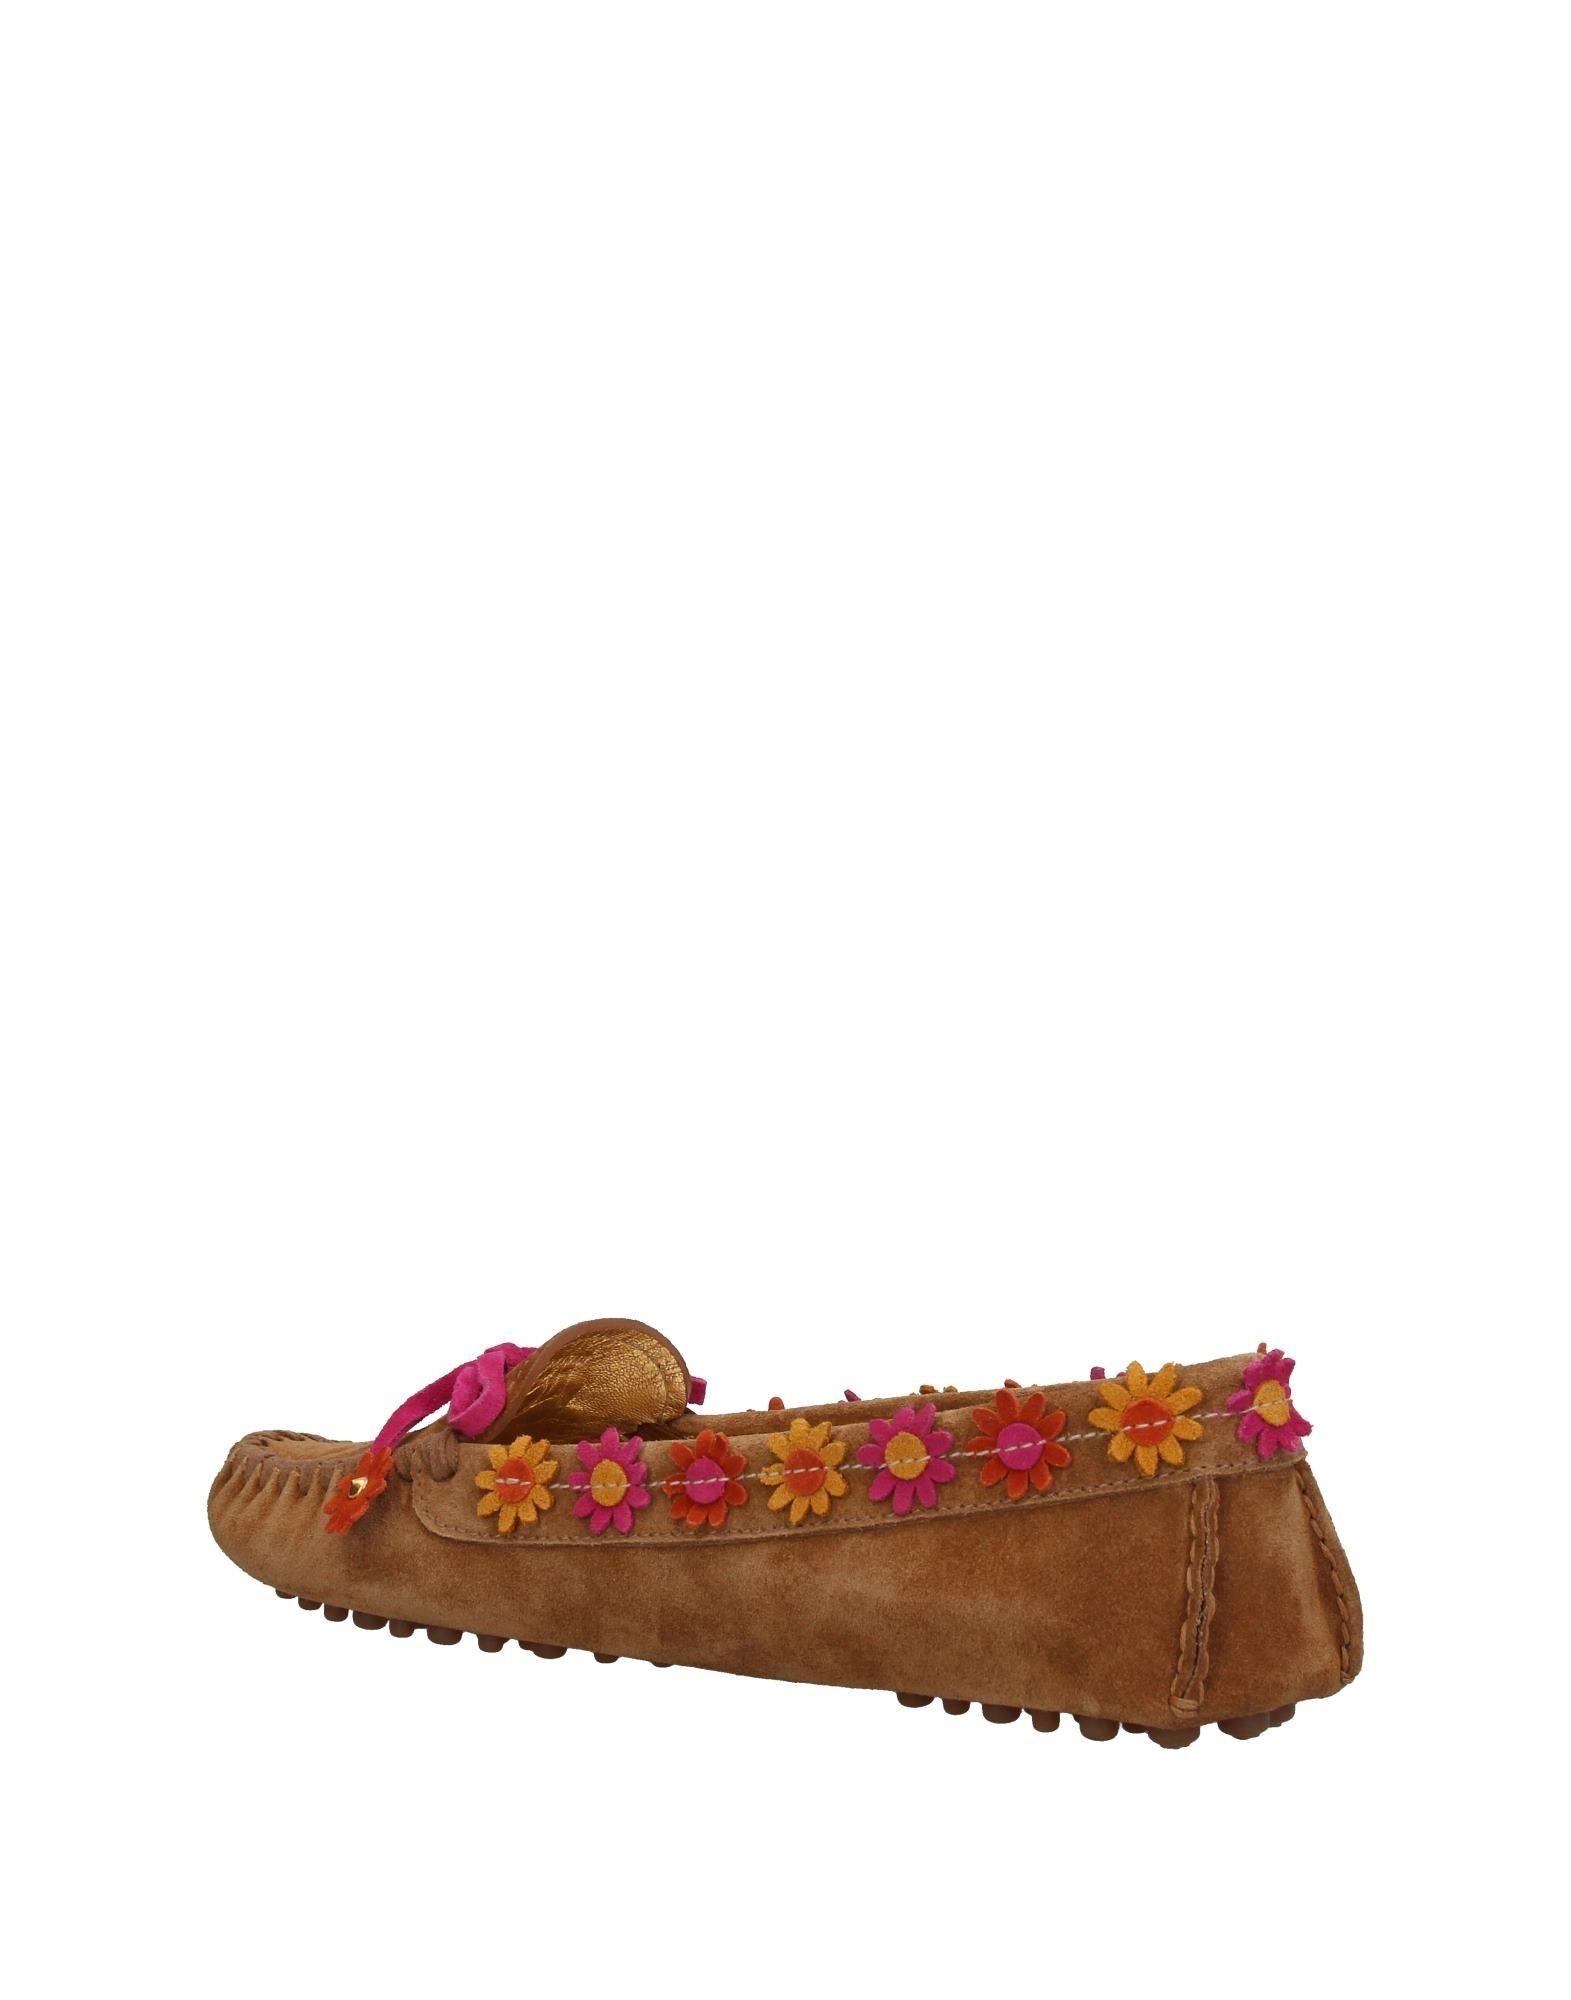 Haltbare Mode billige Schuhe Carshoe Mokassins Damen  11392328PU Schuhe Heiße Schuhe 11392328PU f028d0